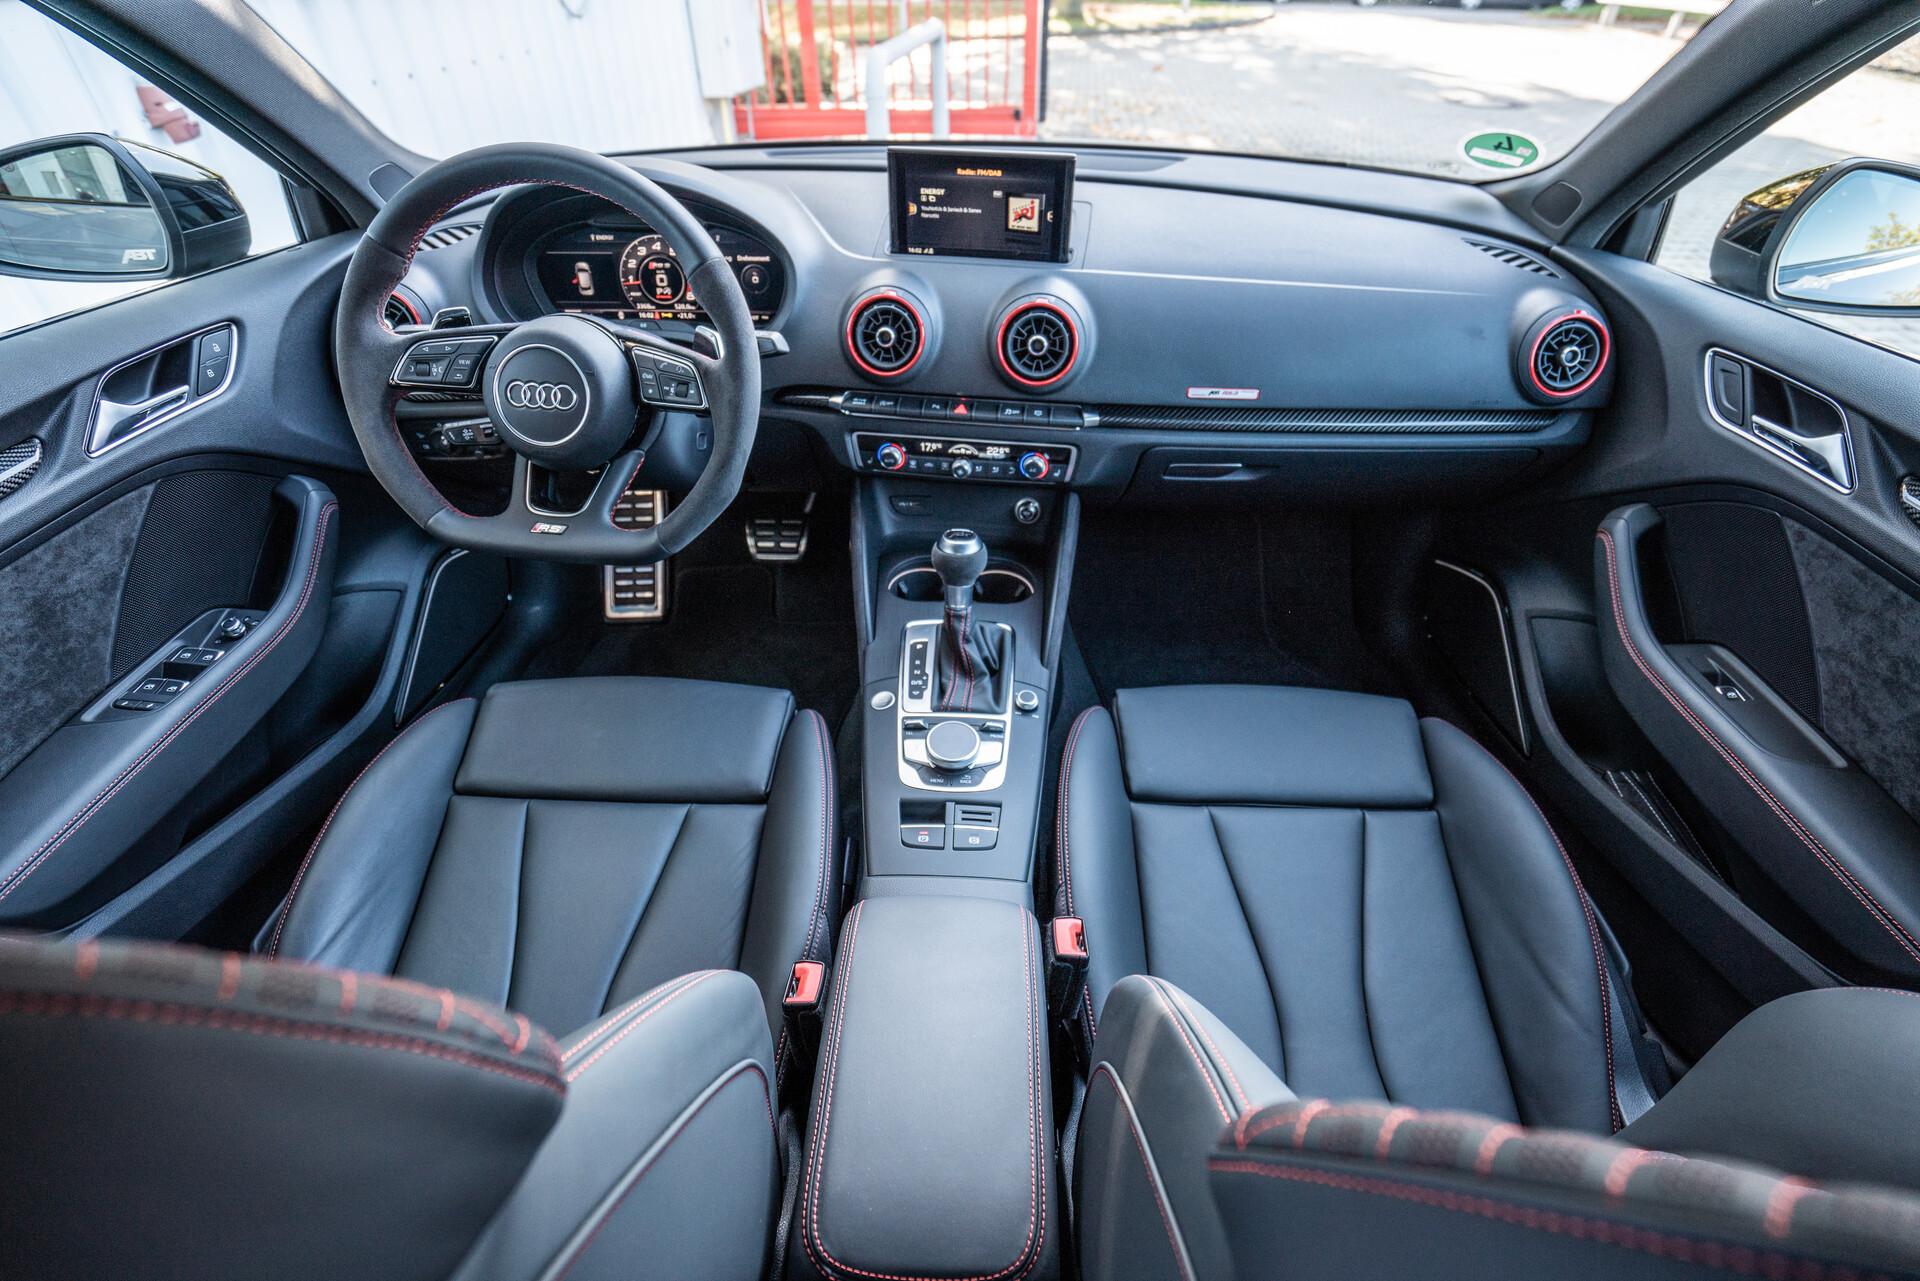 Abt Audi RS3 Sportback 2.5 TFSI Quattro 470 LE | Abt ...